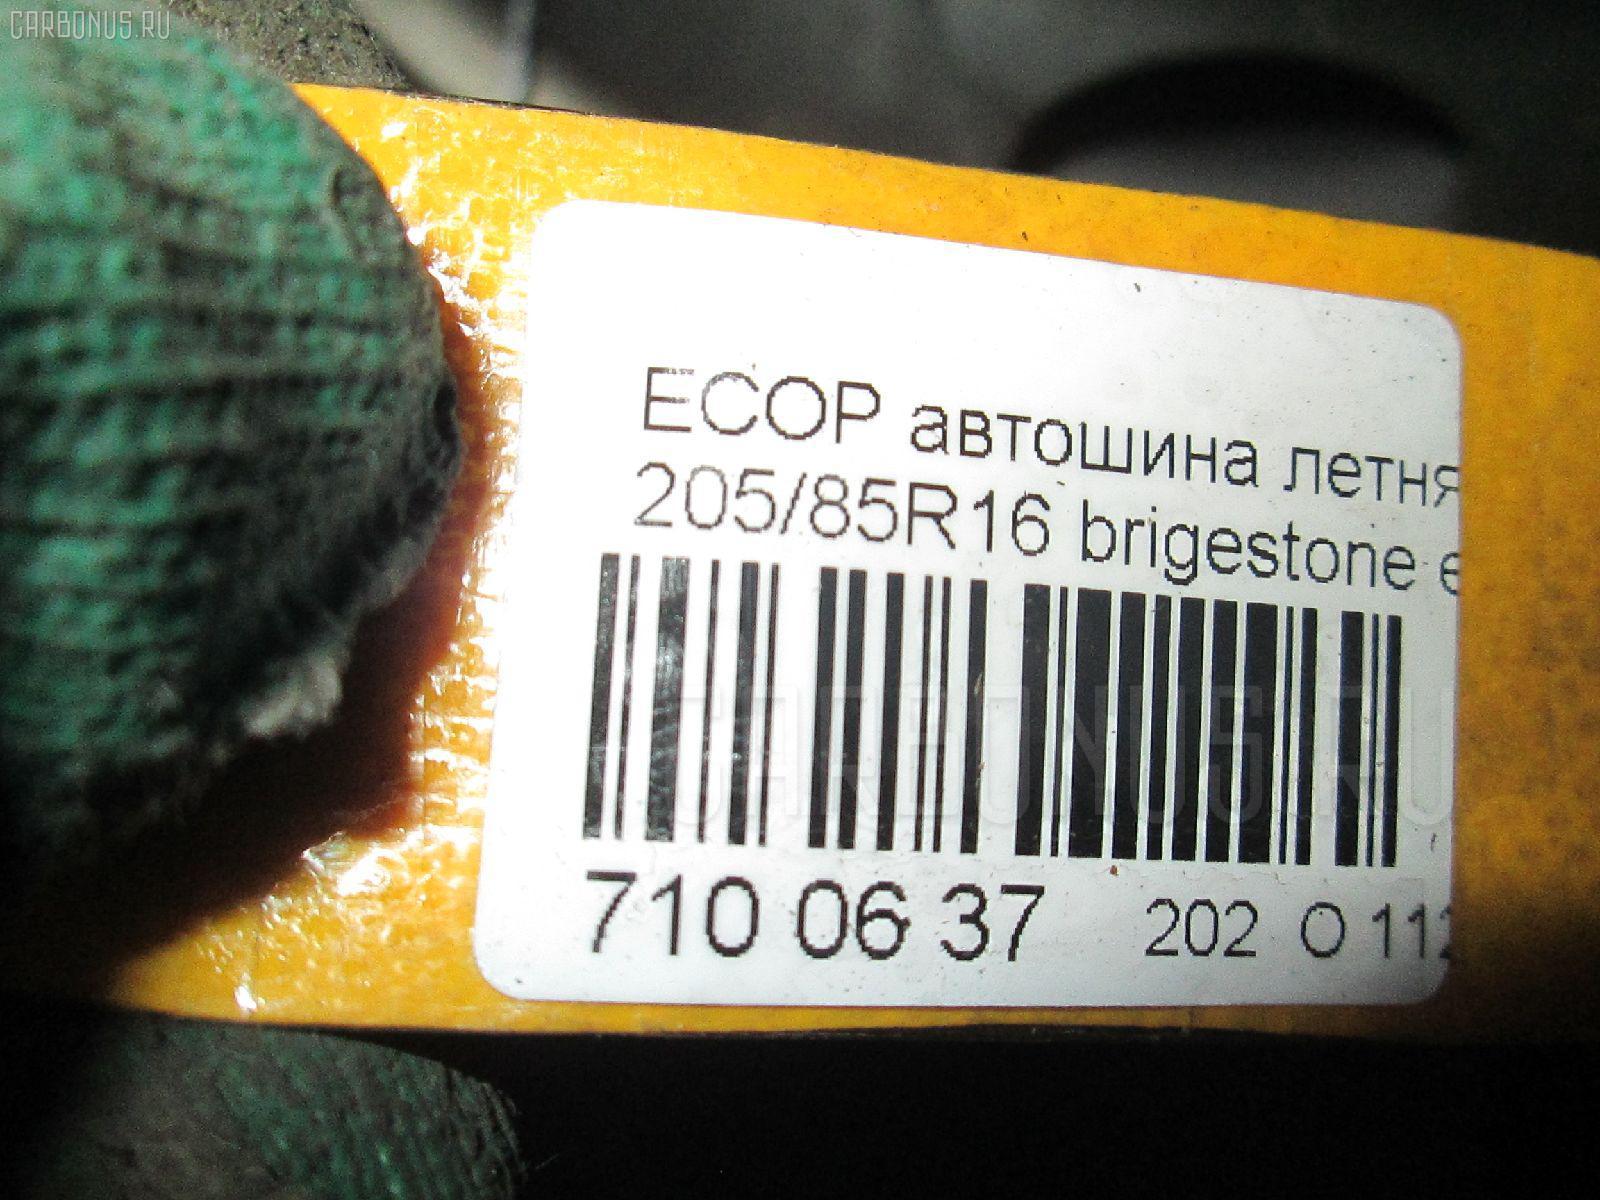 Автошина грузовая летняя ECOPIA M812 205/85R16LT BRIGESTONE Фото 8